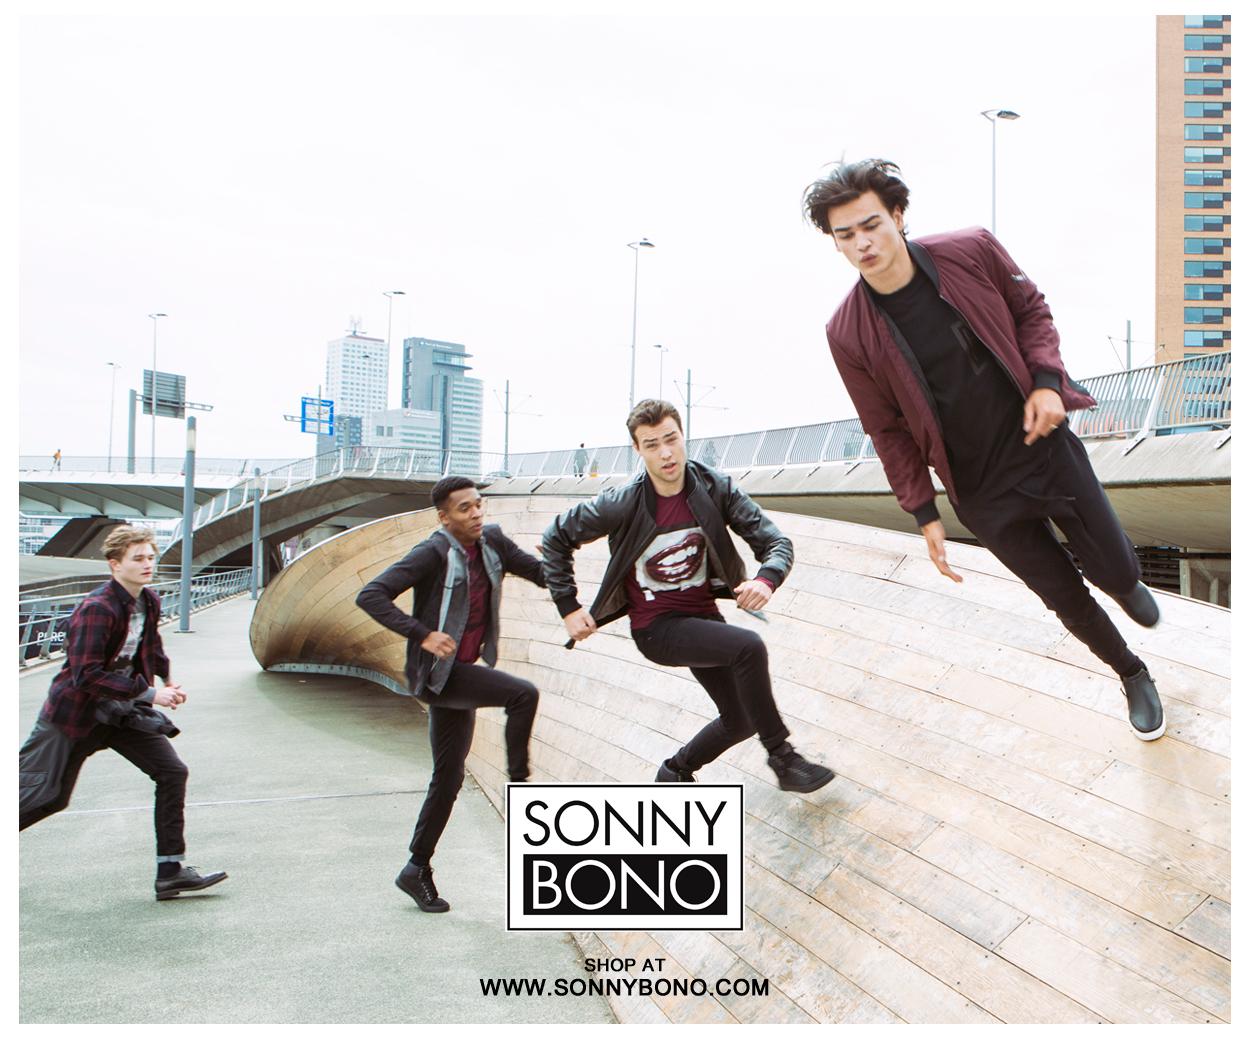 Sonny Sonny Bono Bono Empoli CENTRO 8On6R